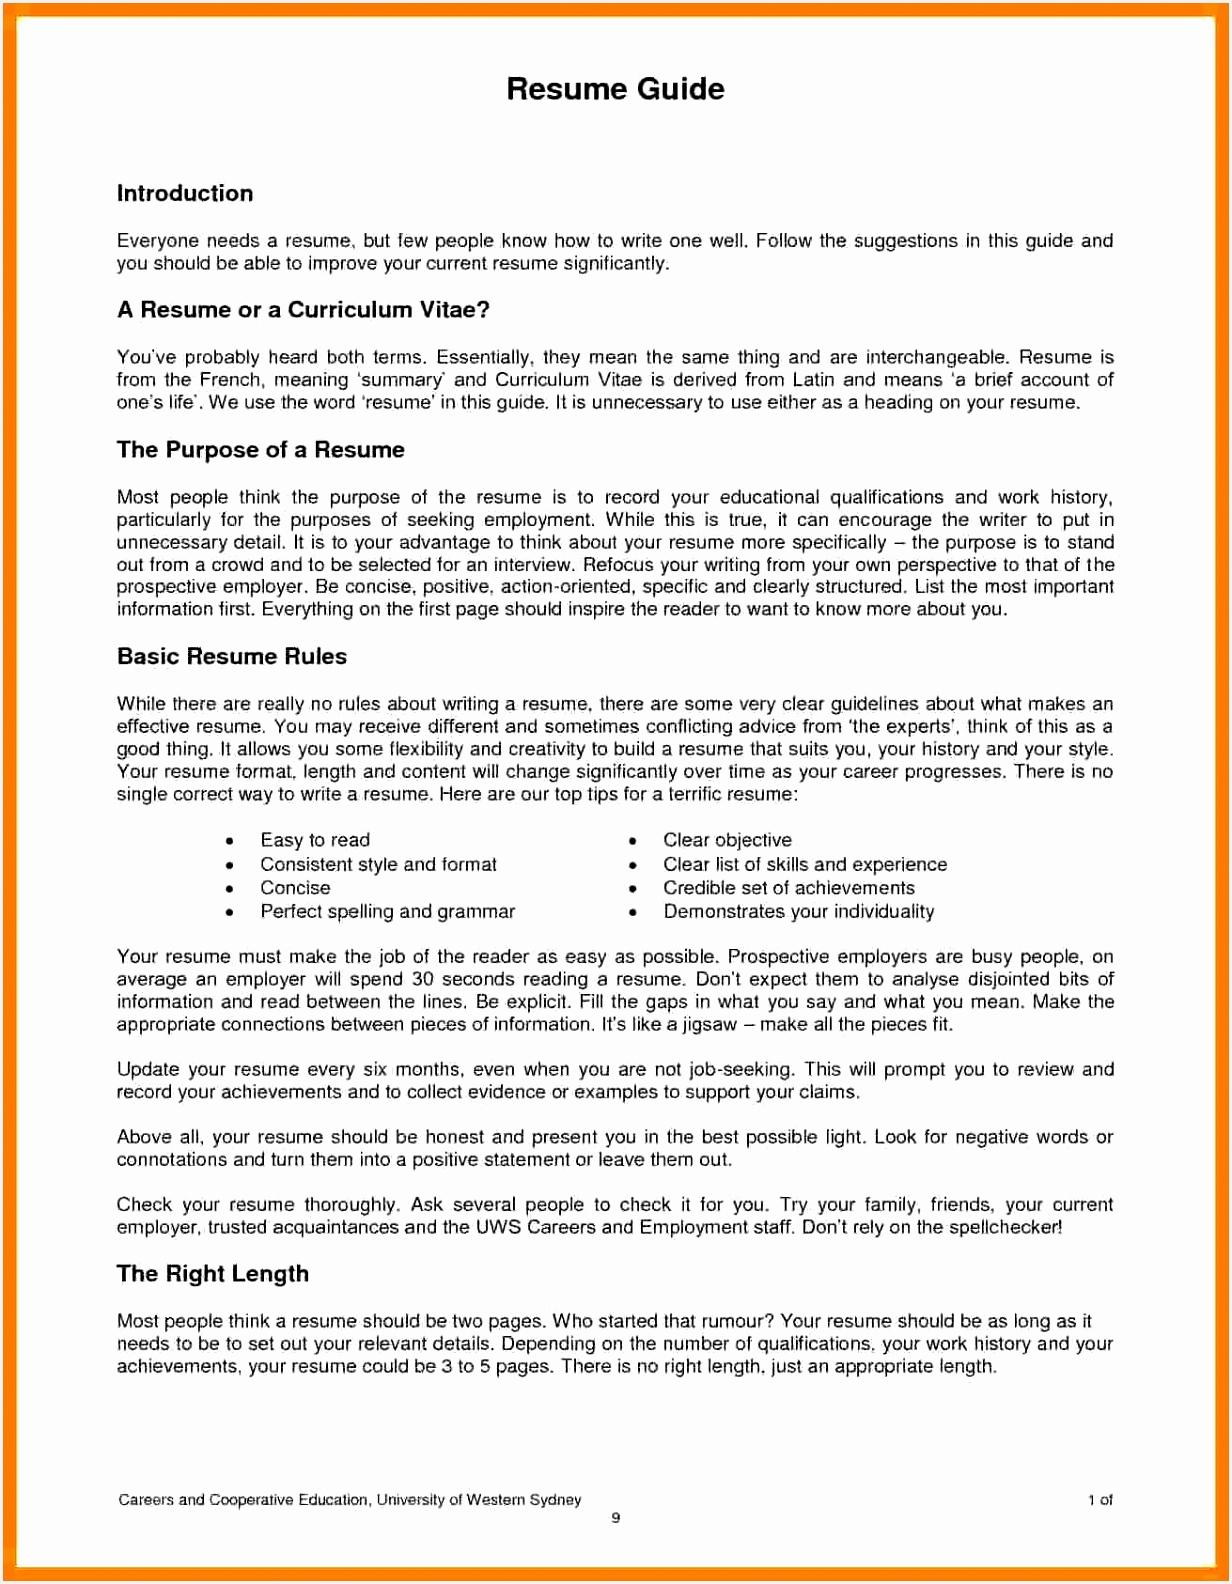 Federal Government Resume Sample Fhr2h Unique Government Resume Examples Beautiful 49 Concepts Sample Job Resume Of 7 Federal Government Resume Sample